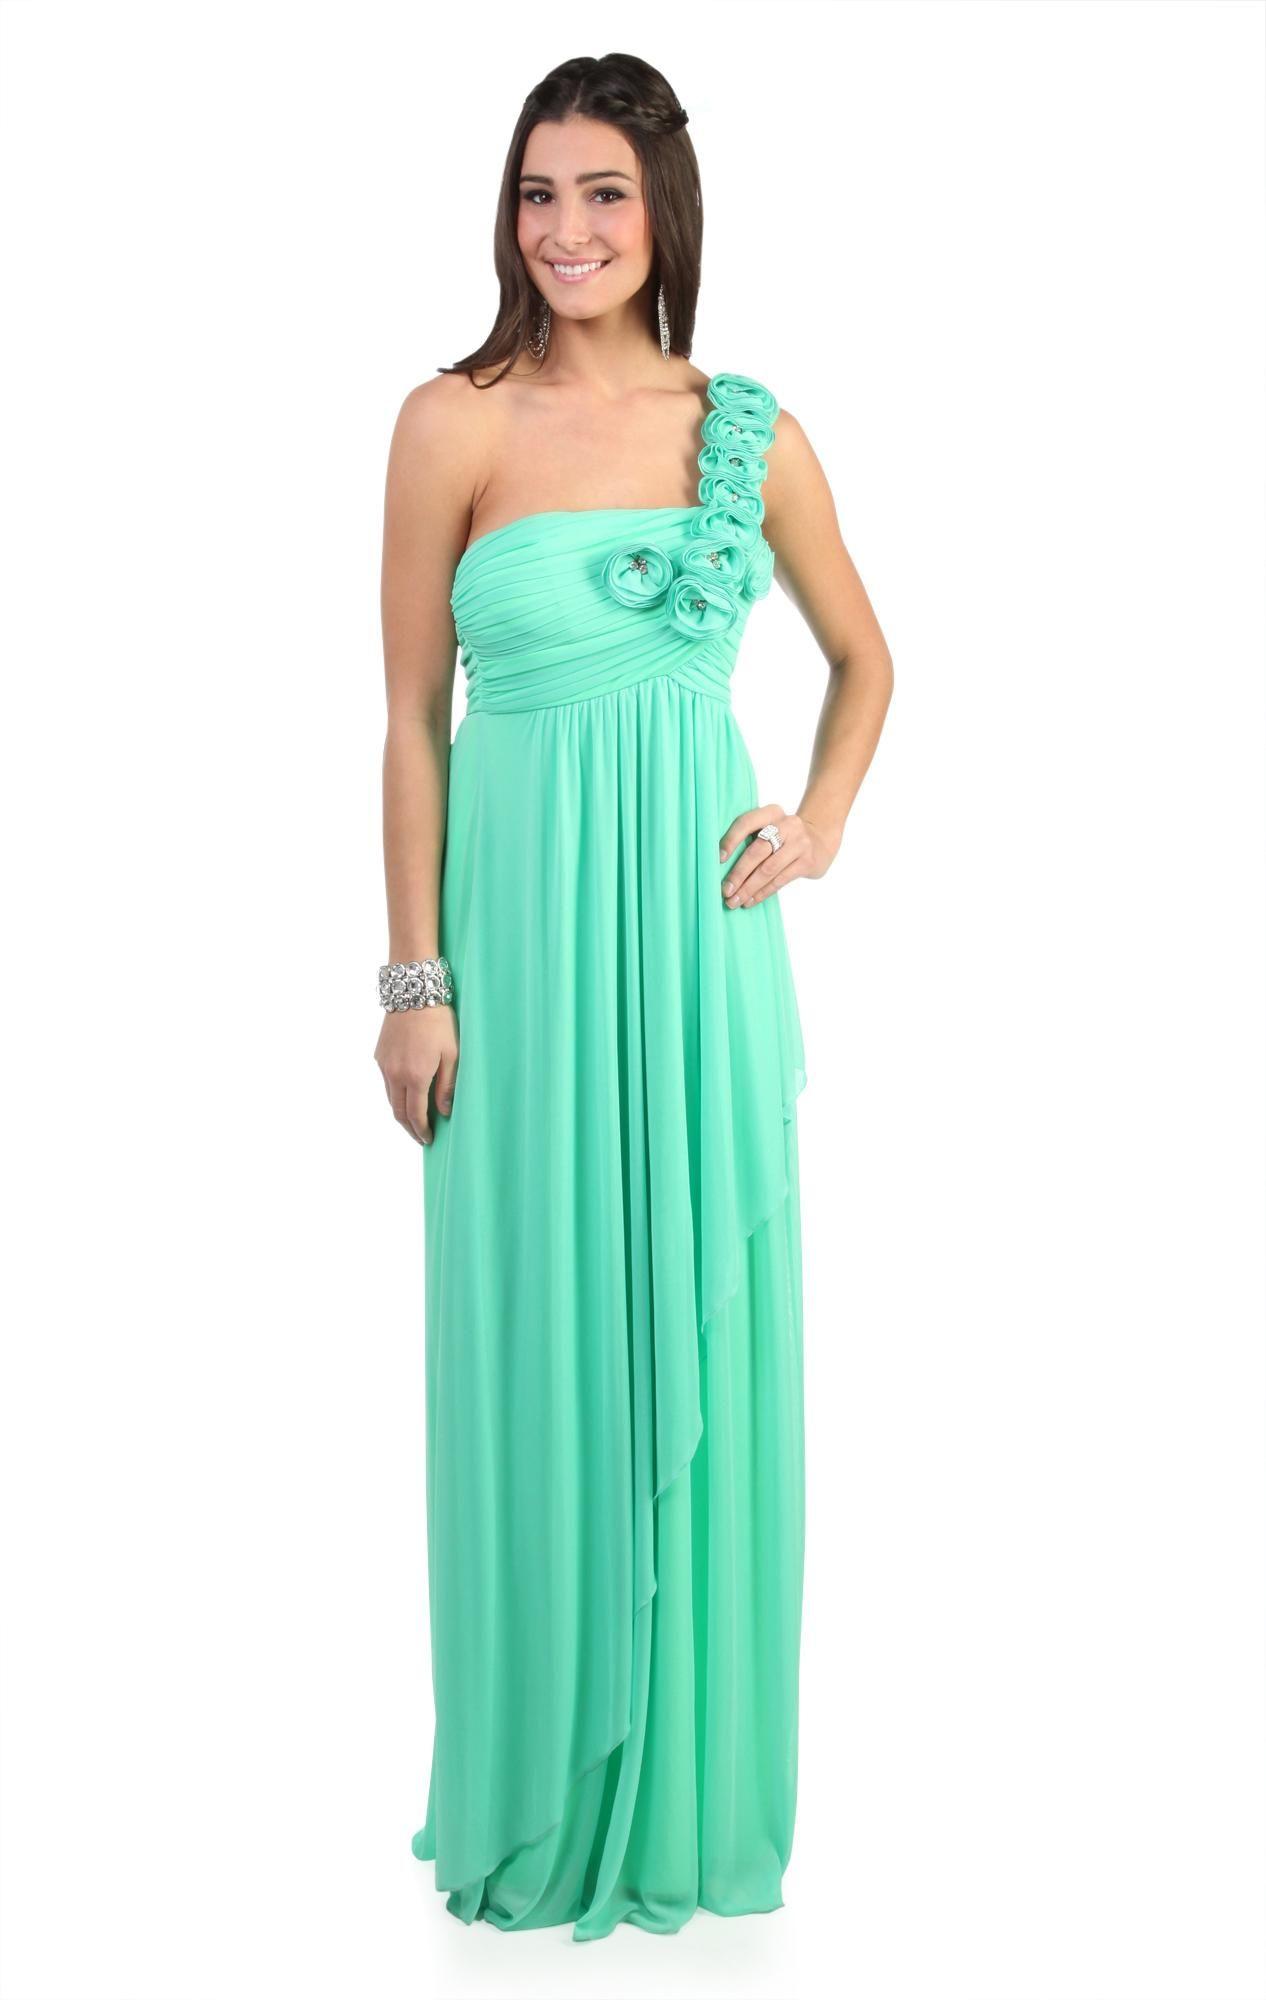 Asombroso Vestidos De Dama Deb Modelo - Ideas de Estilos de Vestido ...